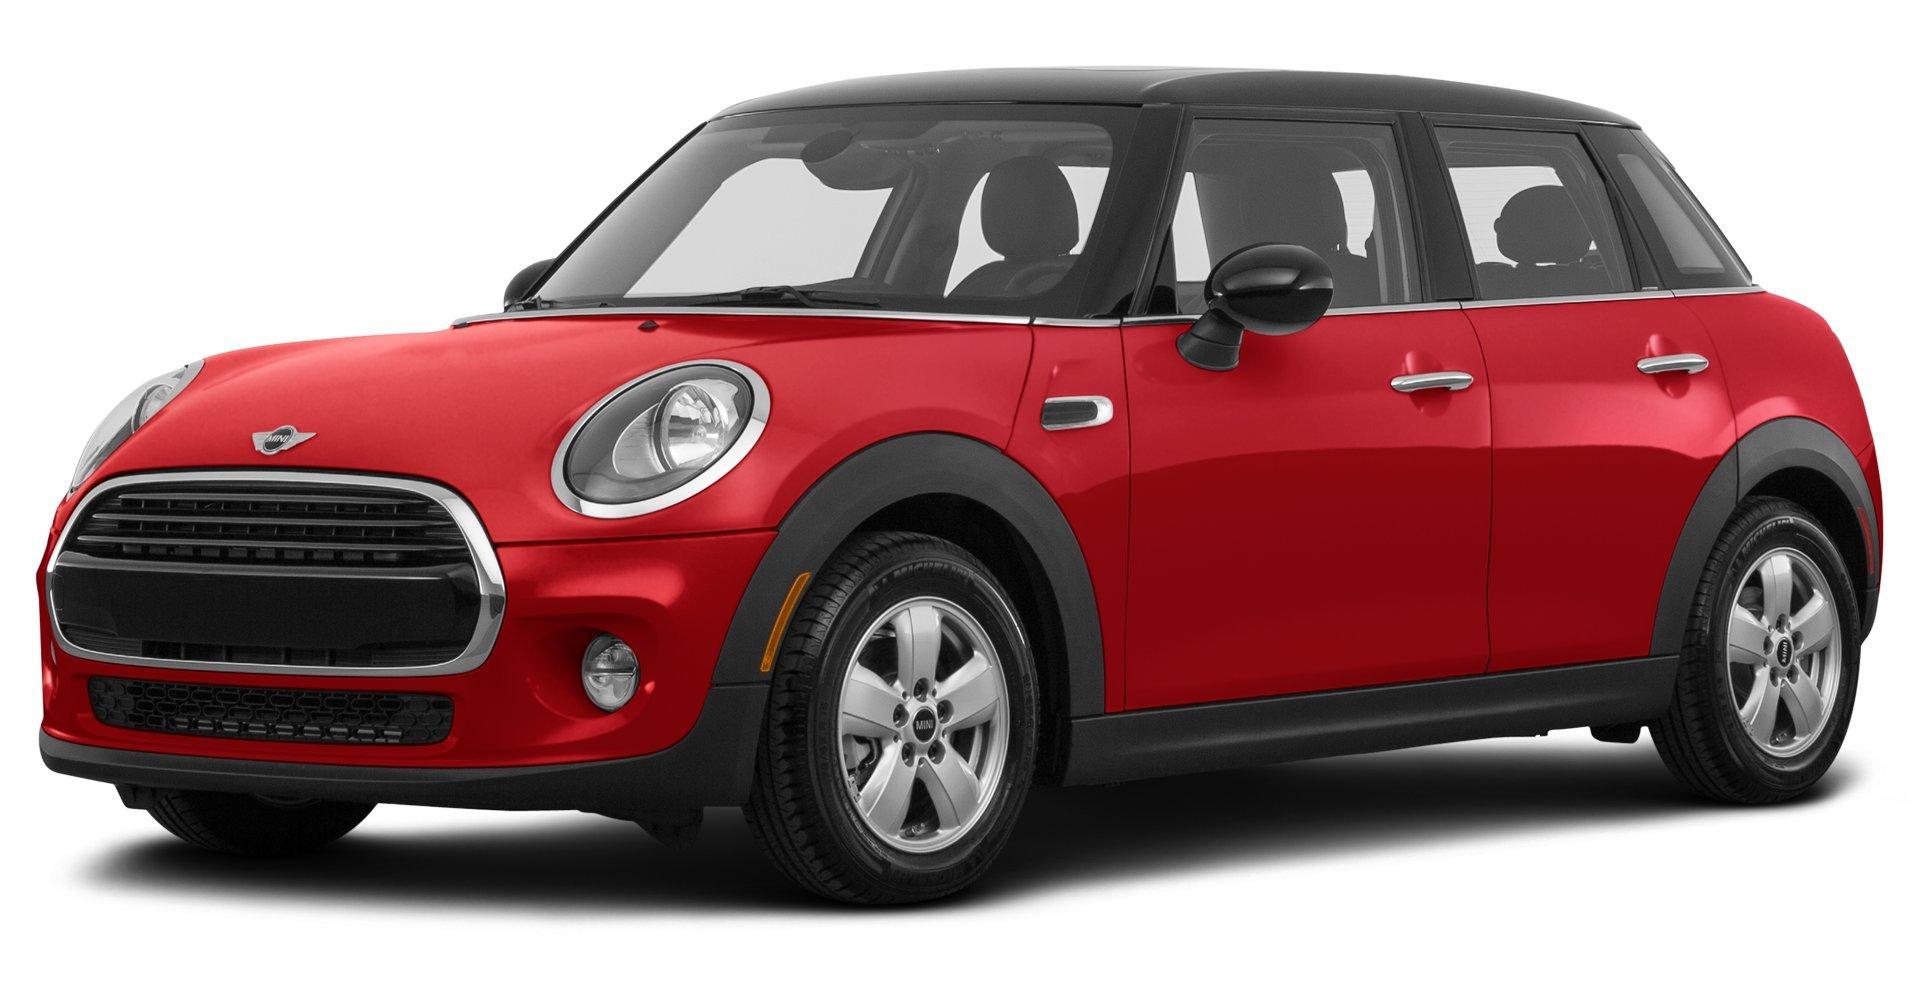 Amazoncom 2016 Mini Cooper Reviews Images And Specs Vehicles